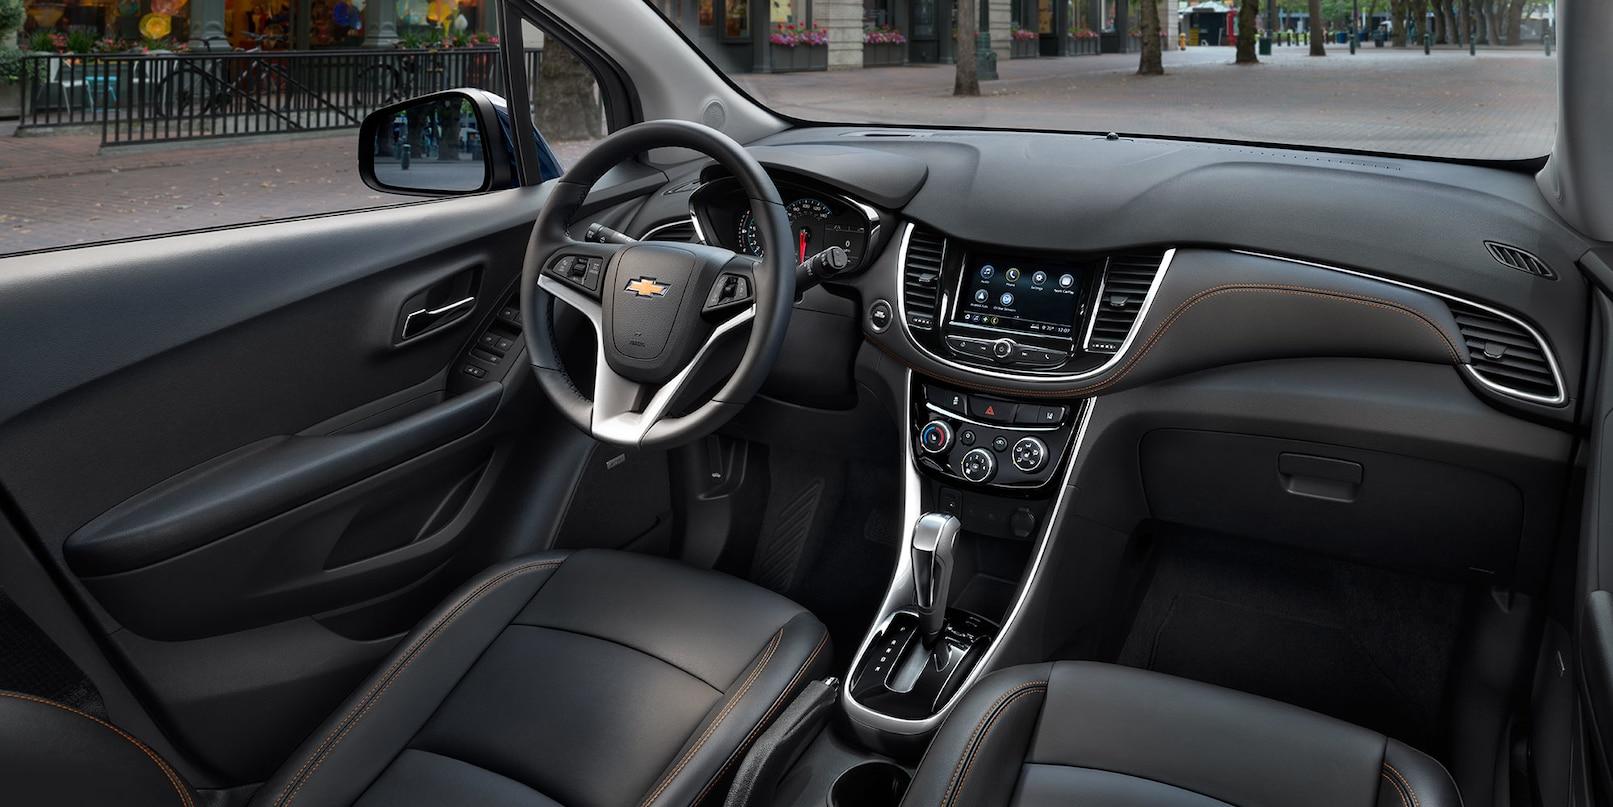 2019 Chevrolet Trax Center Console